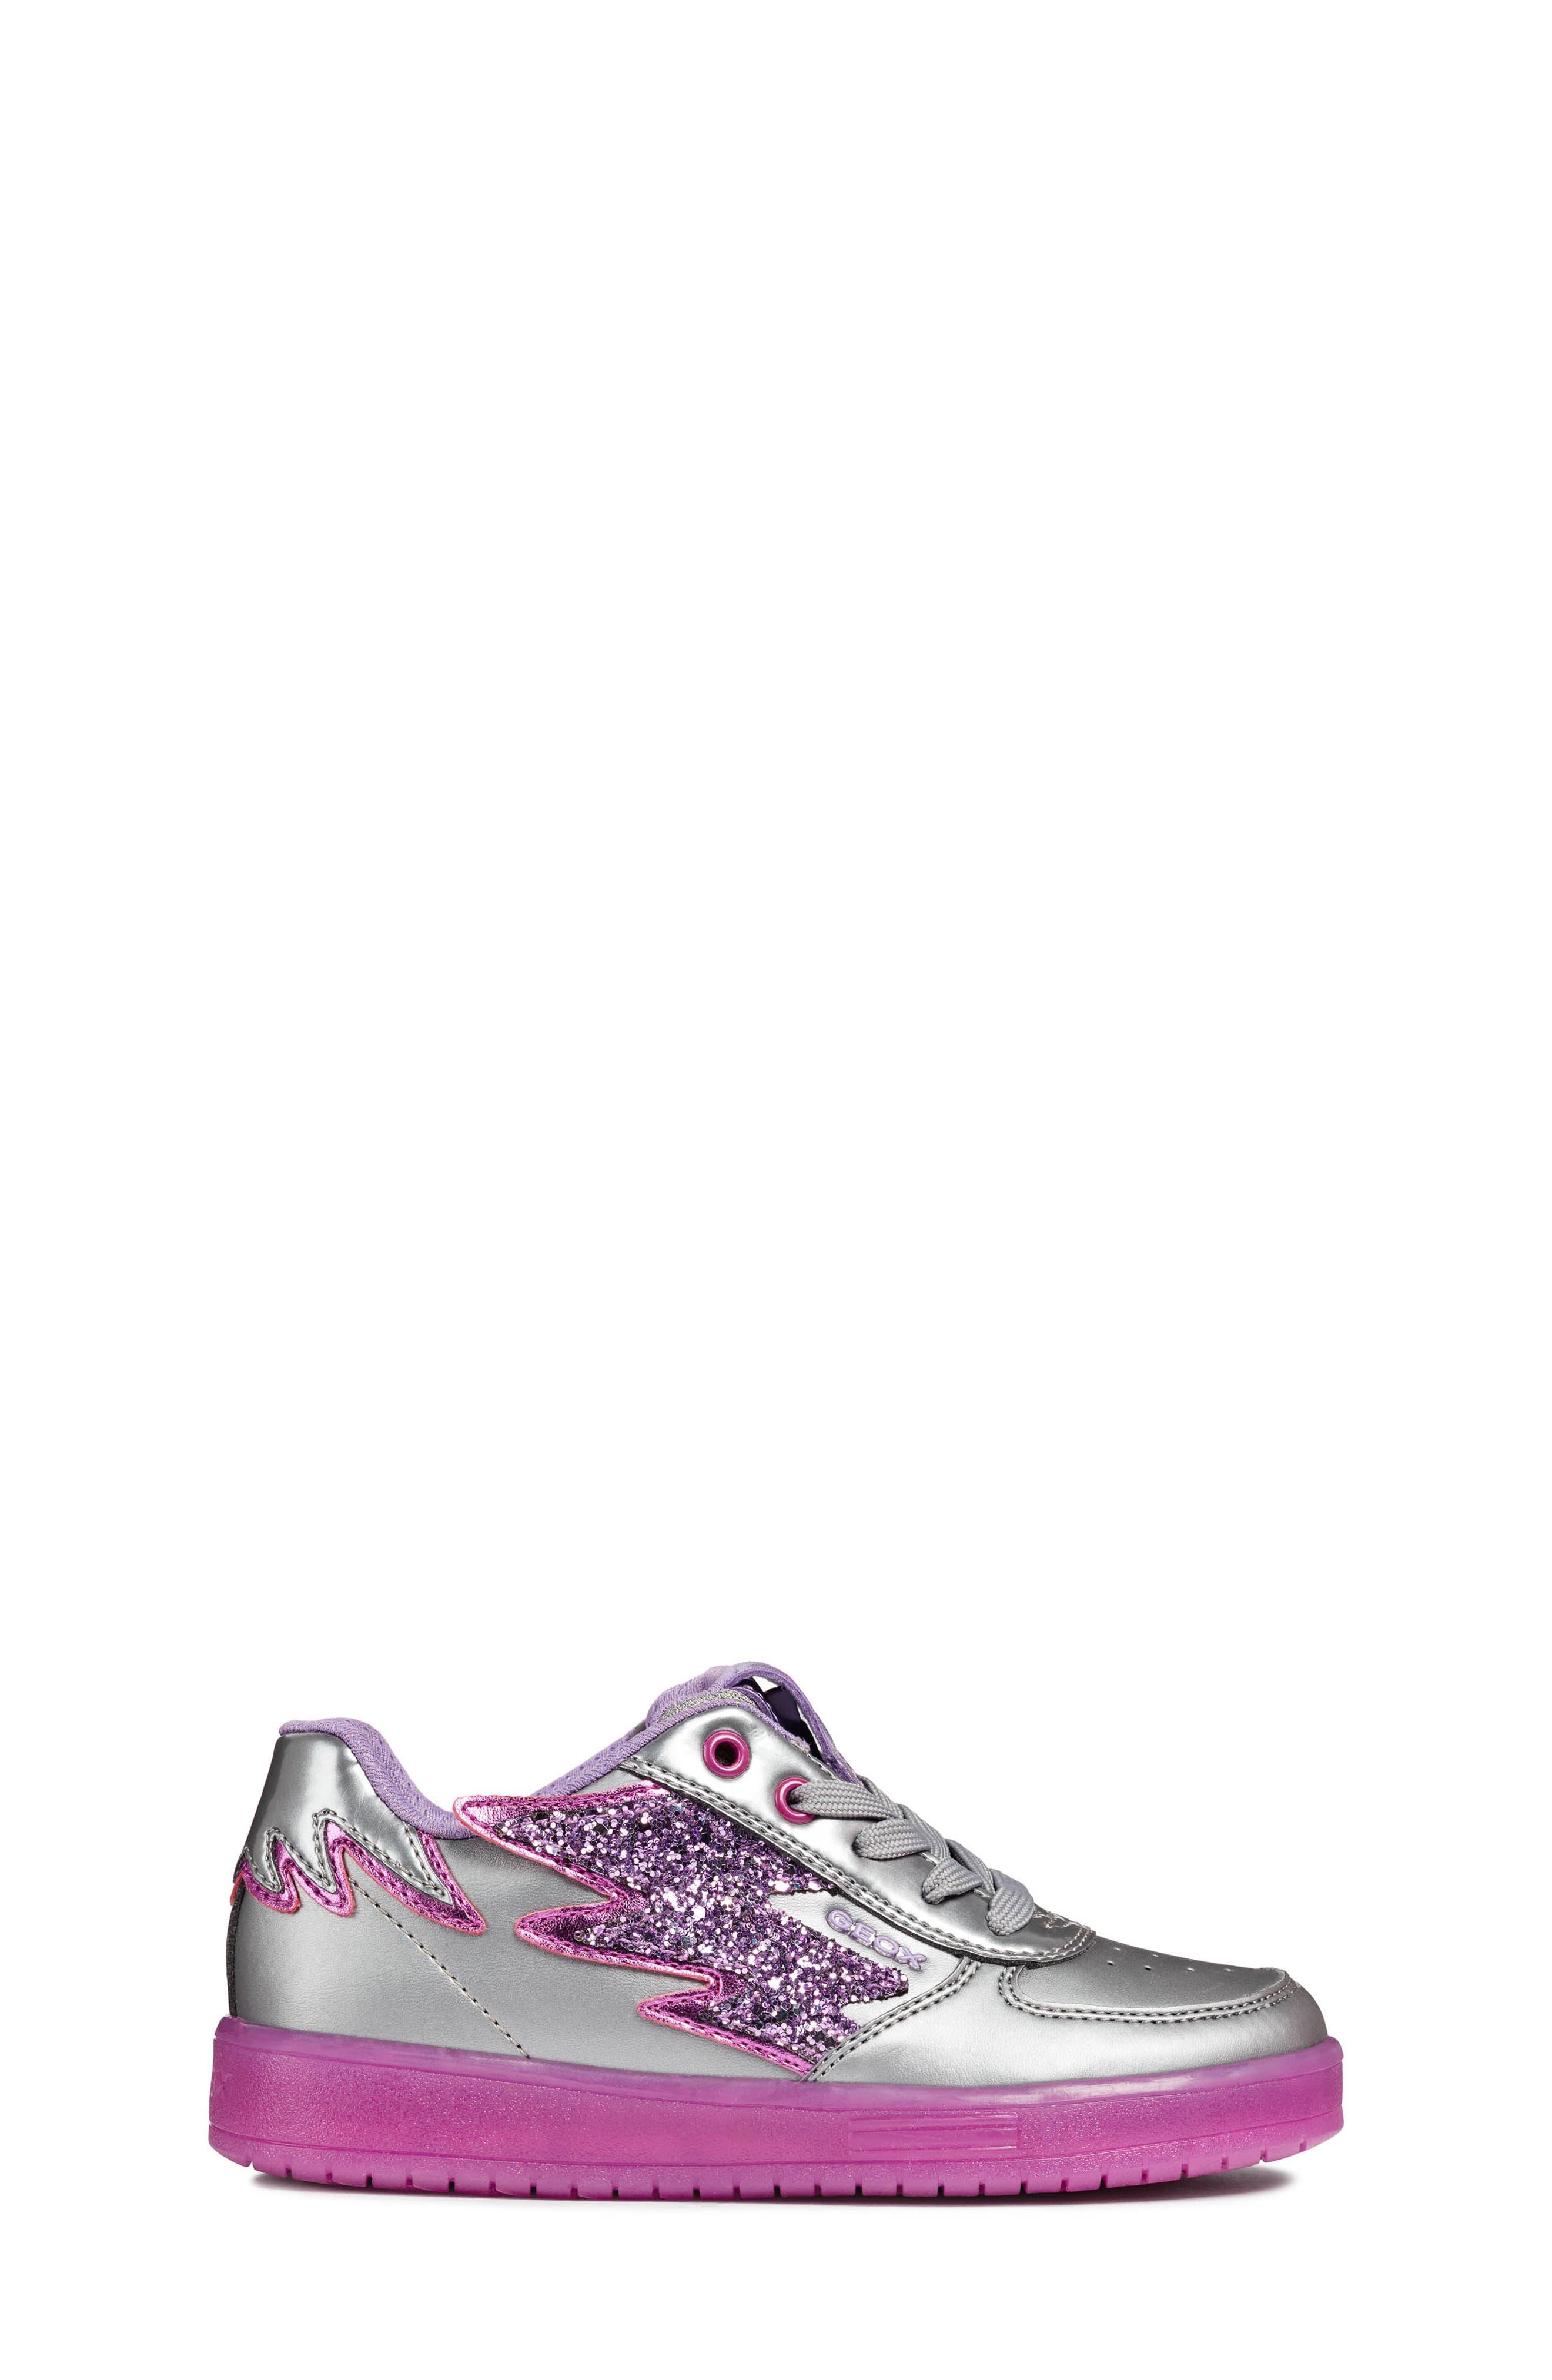 Kommodor Glitter Light Up Sneaker,                             Alternate thumbnail 3, color,                             DARK SILVER/LILAC